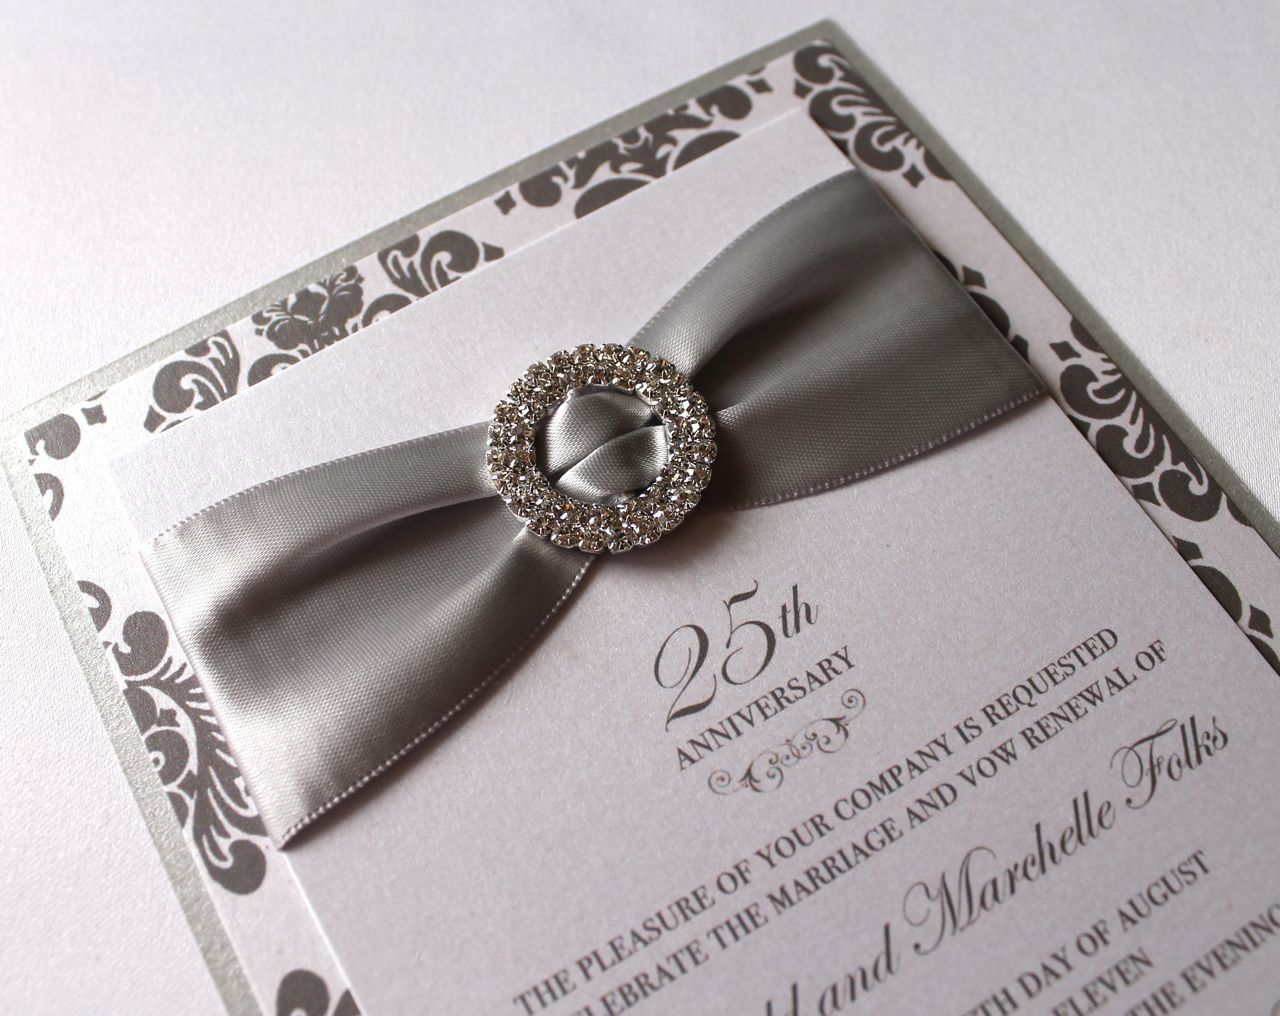 25th Wedding Anniversary Invitations wedding invitation into a